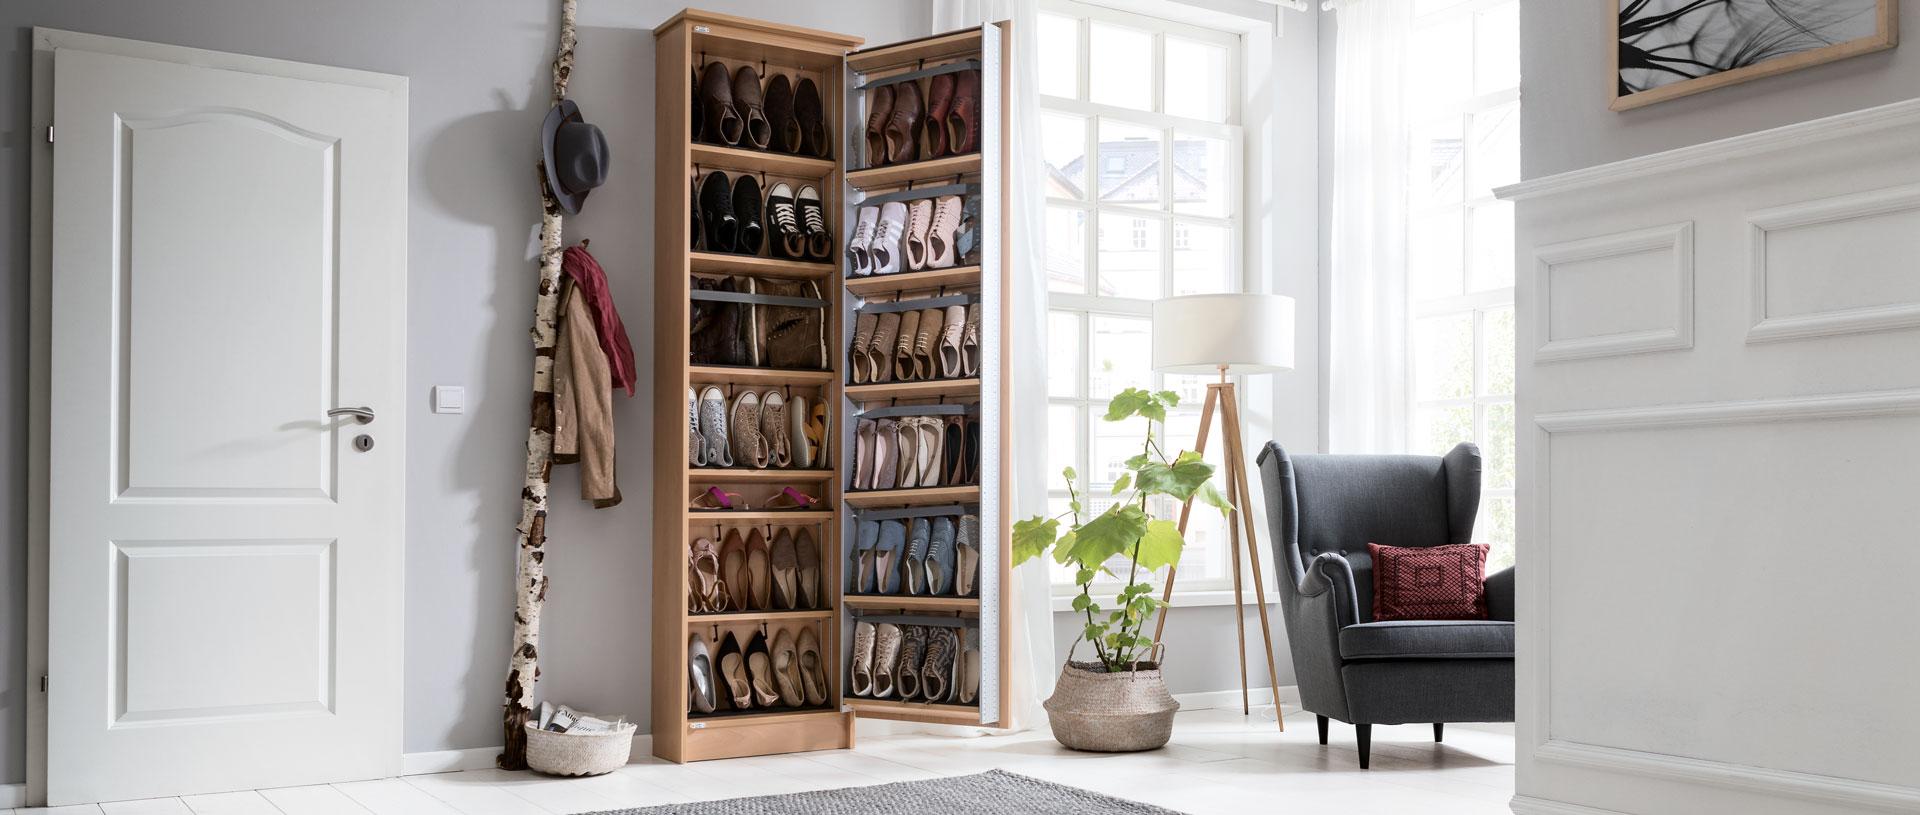 startseite schuhbutler. Black Bedroom Furniture Sets. Home Design Ideas